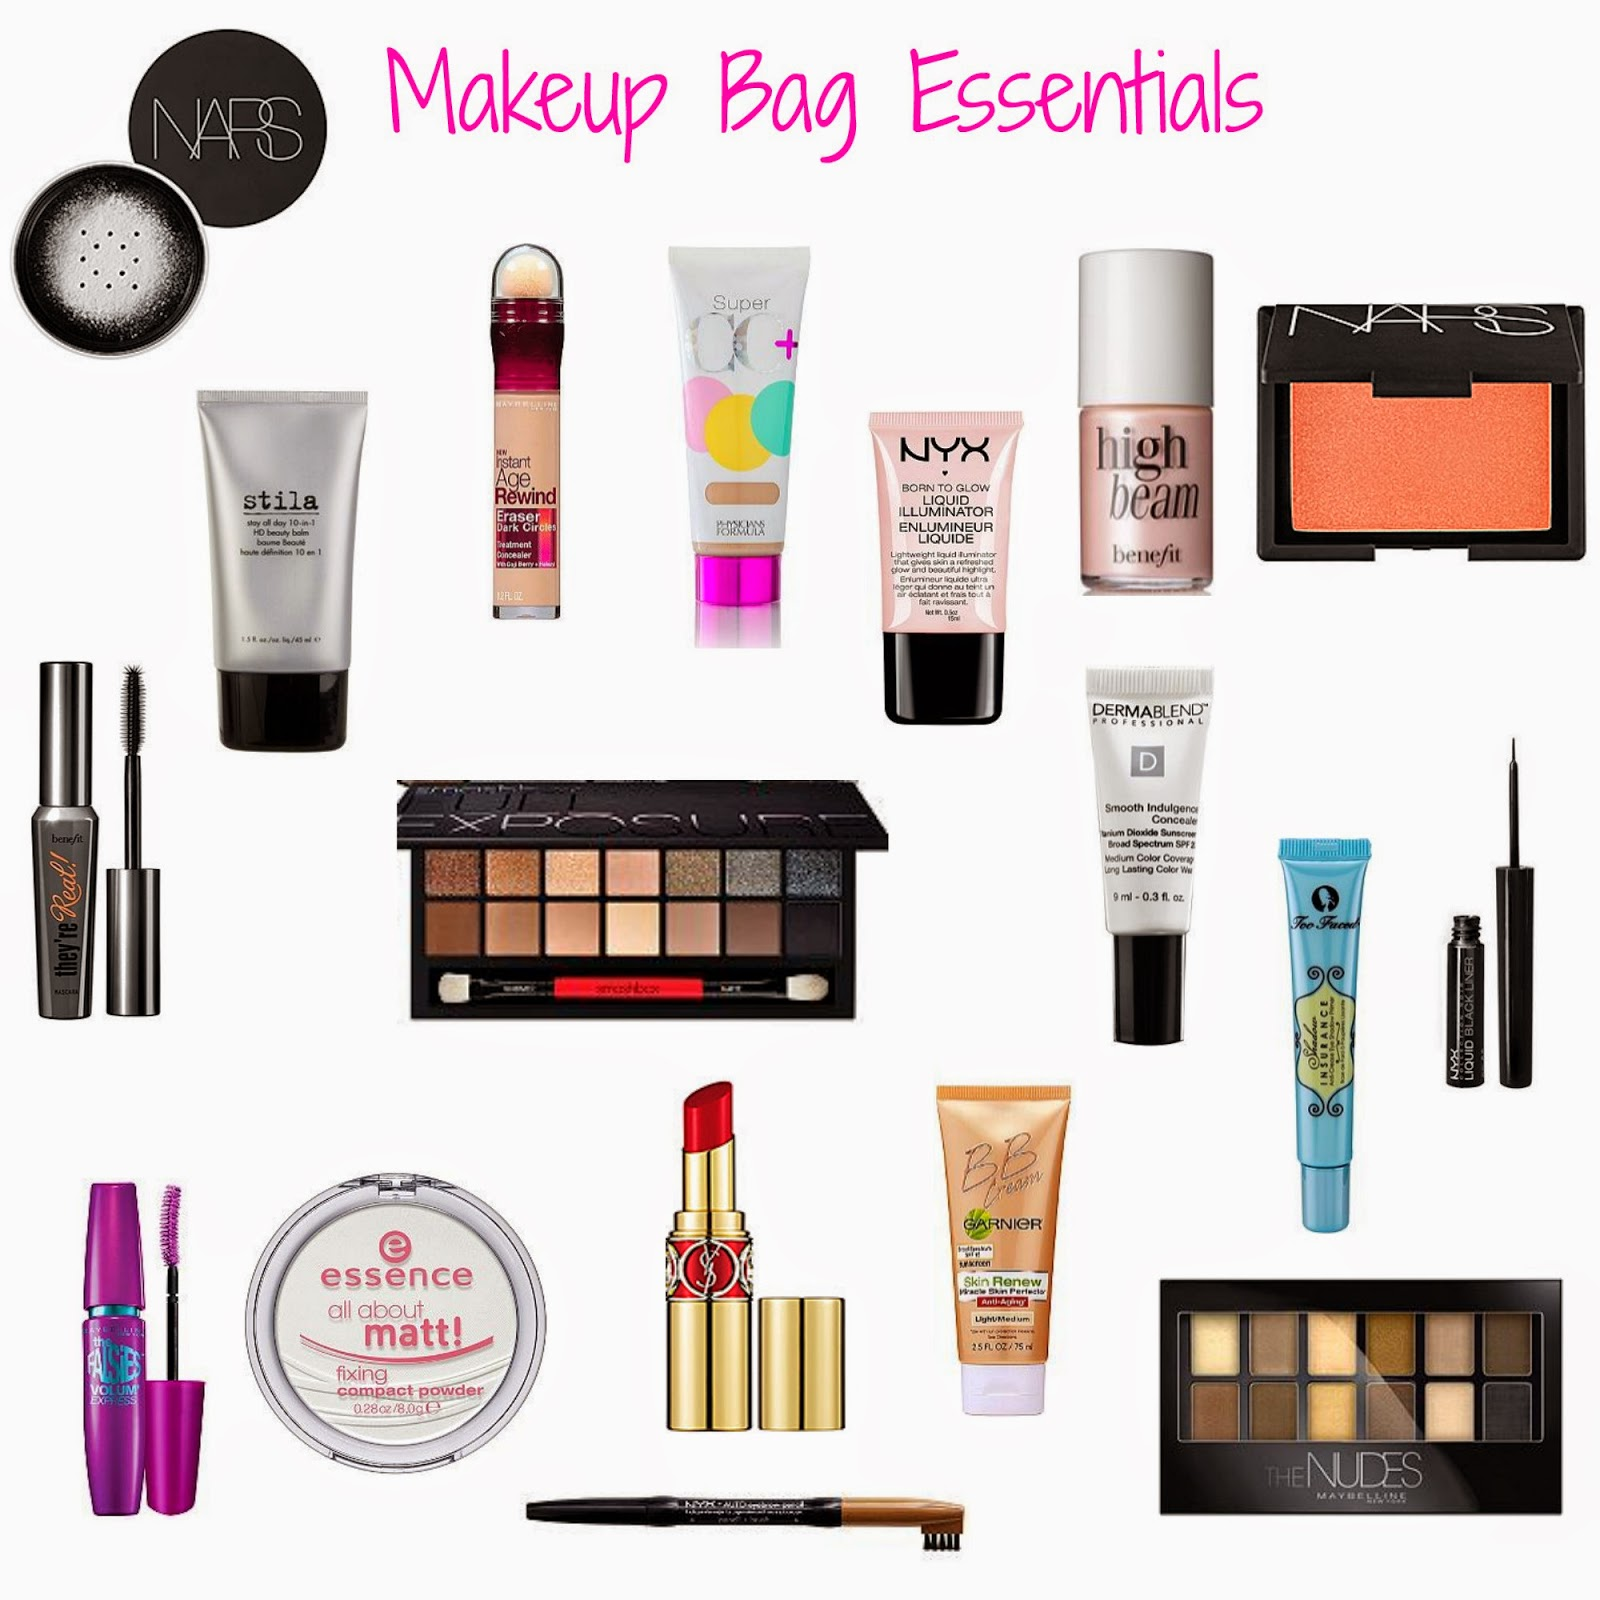 Lot 48: make up bag essentials